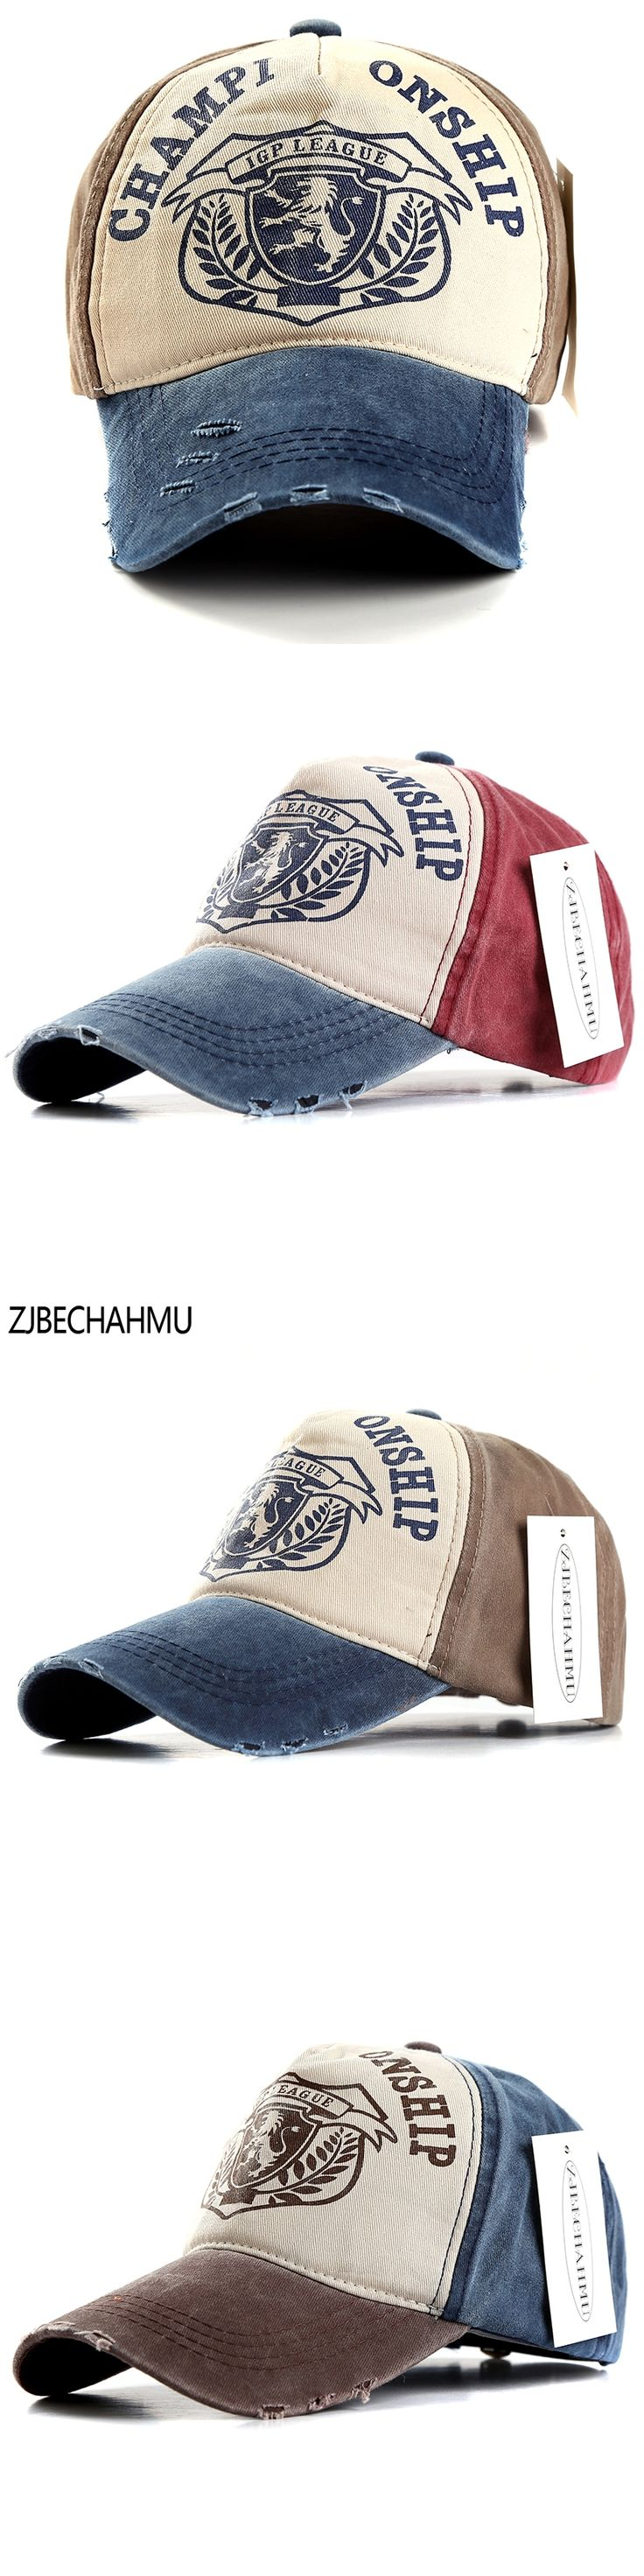 2017 New retro baseball cap women fitted cap snapback hats for men hip hop casual cap cheap hats casquette gorras bone